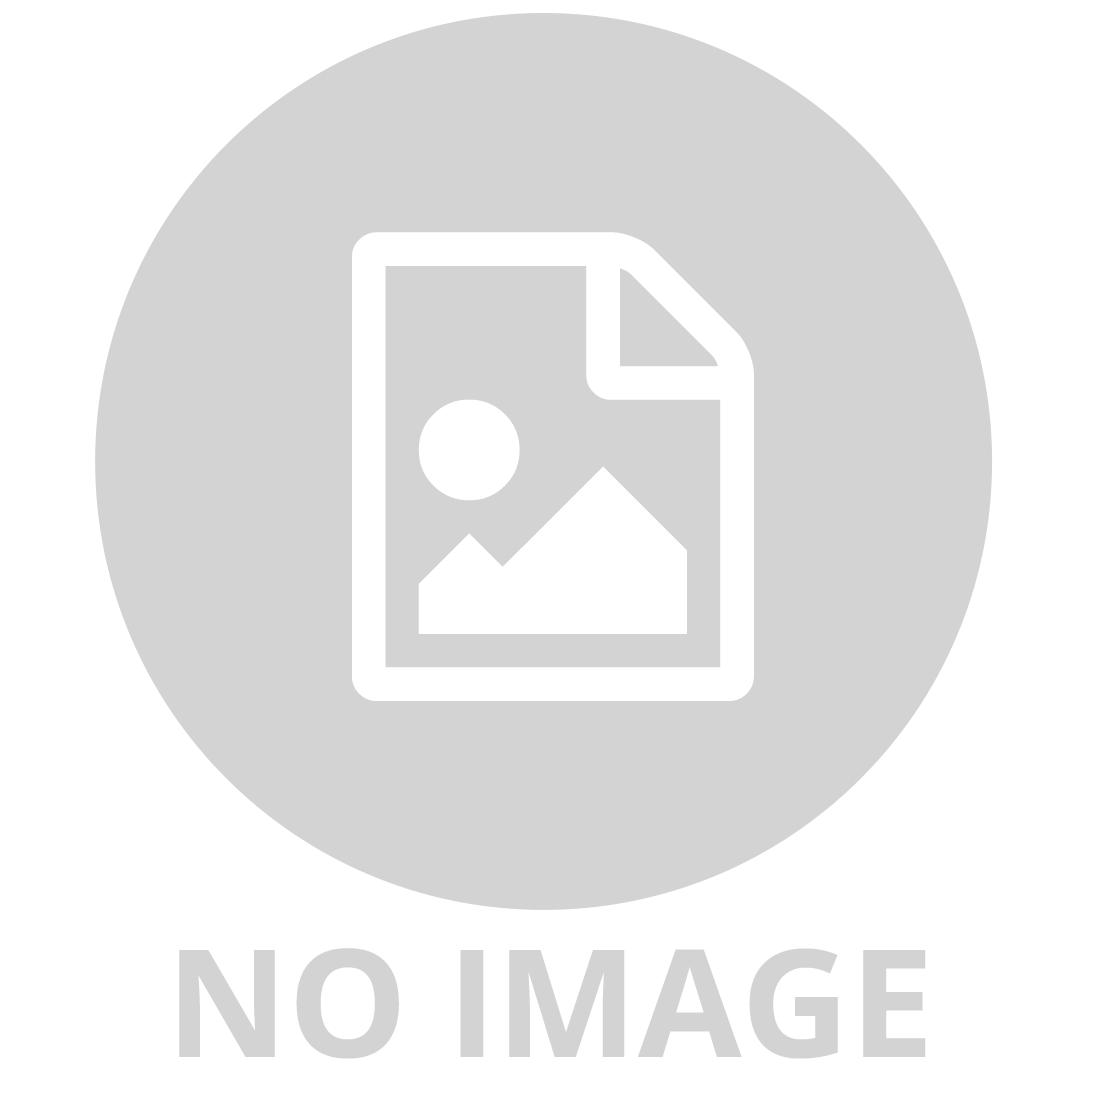 RAVENSBURGER 500 PIECE LARGE FORMAT PUZZLE BRILLIANT BALLOONS